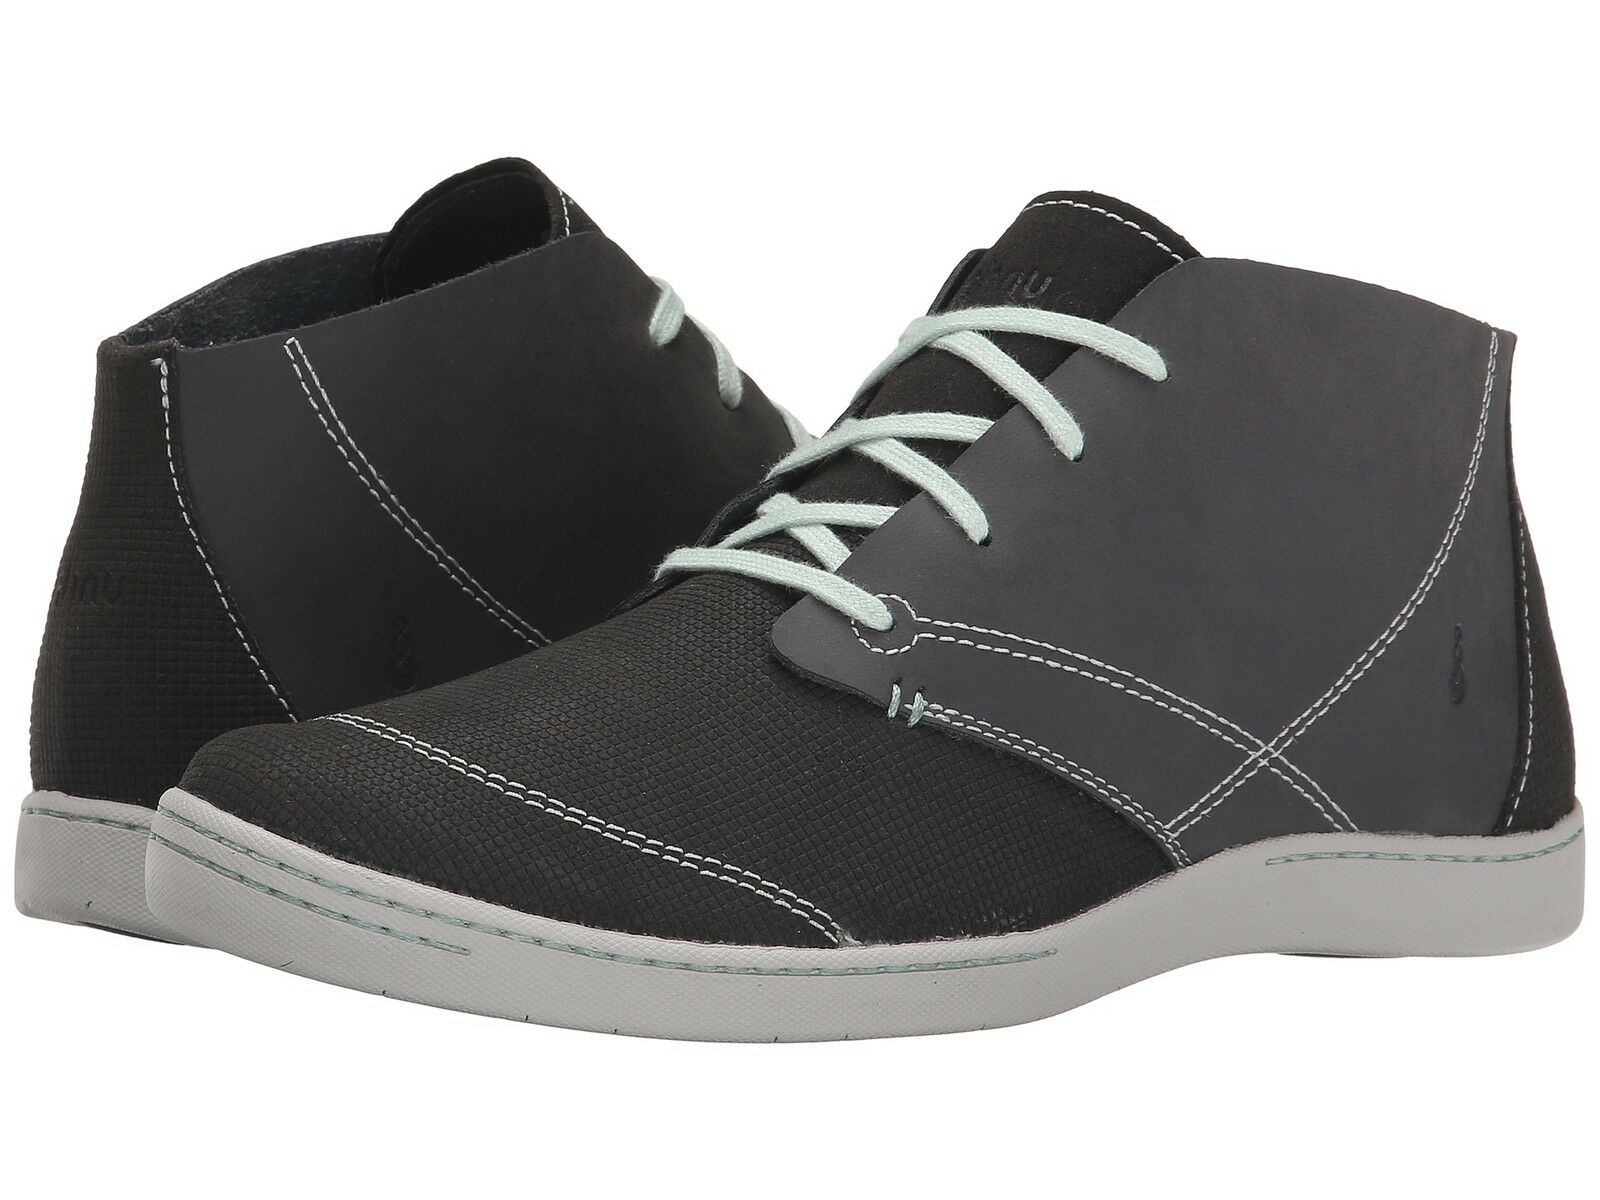 NEU Ahnu Hi Top Athletic Schuhe 9.5 110 Retail Leder Pier 3 Grau